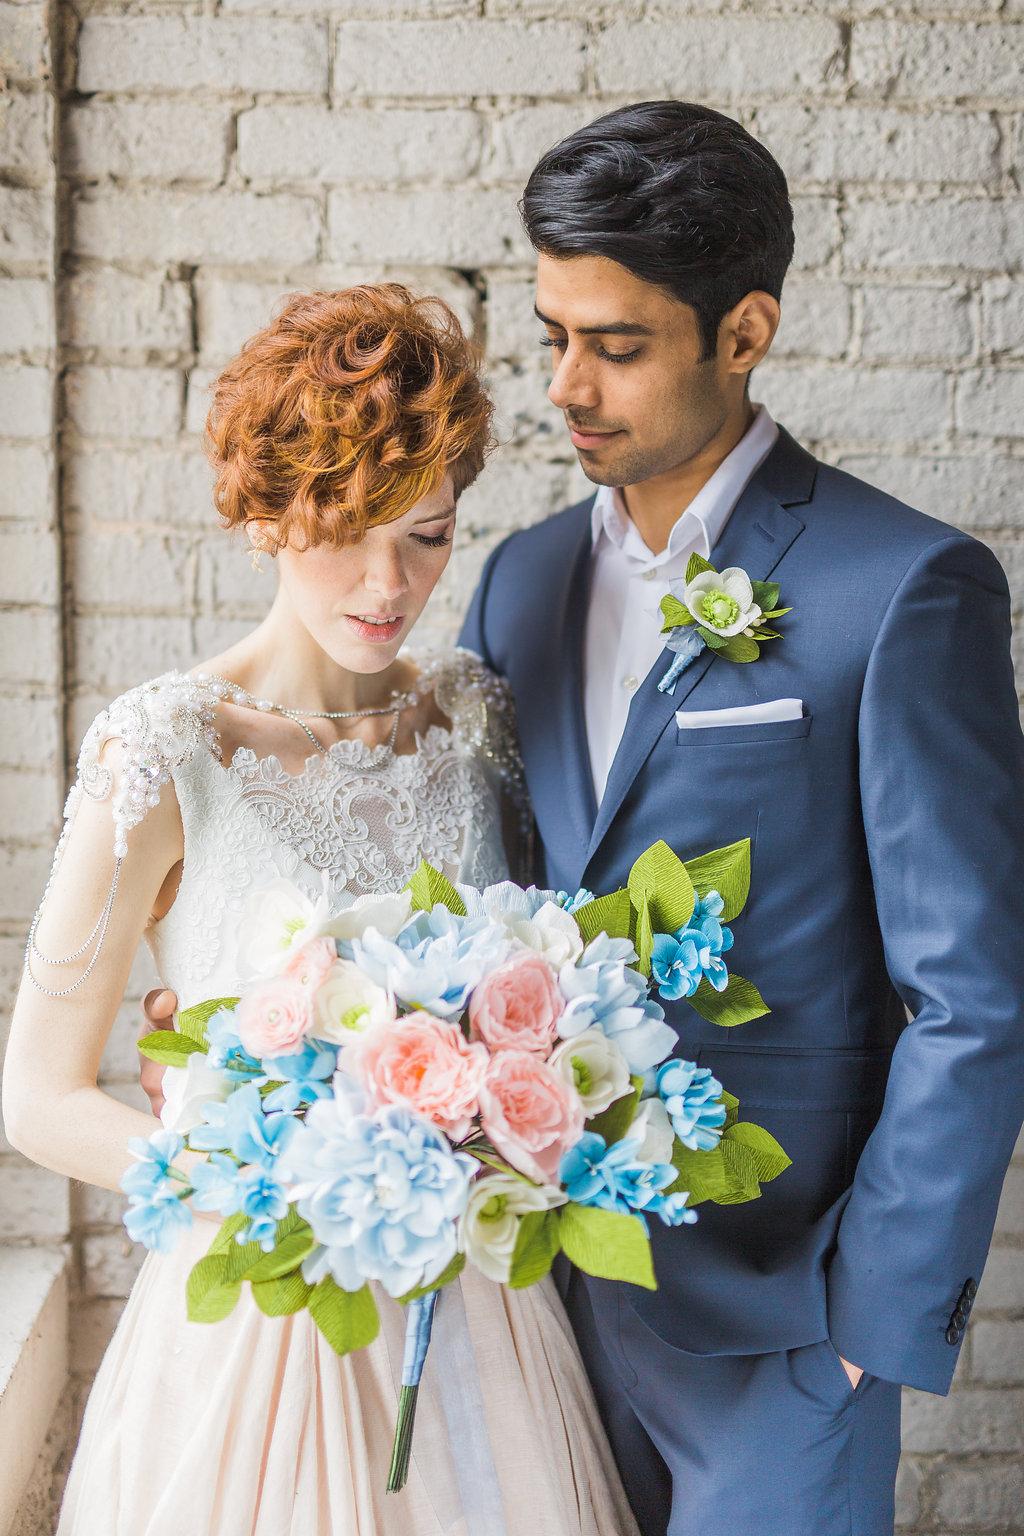 Storys_Building_Paper_Wedding_Inspiration_Photos-Rhythm_Photography-057.jpg